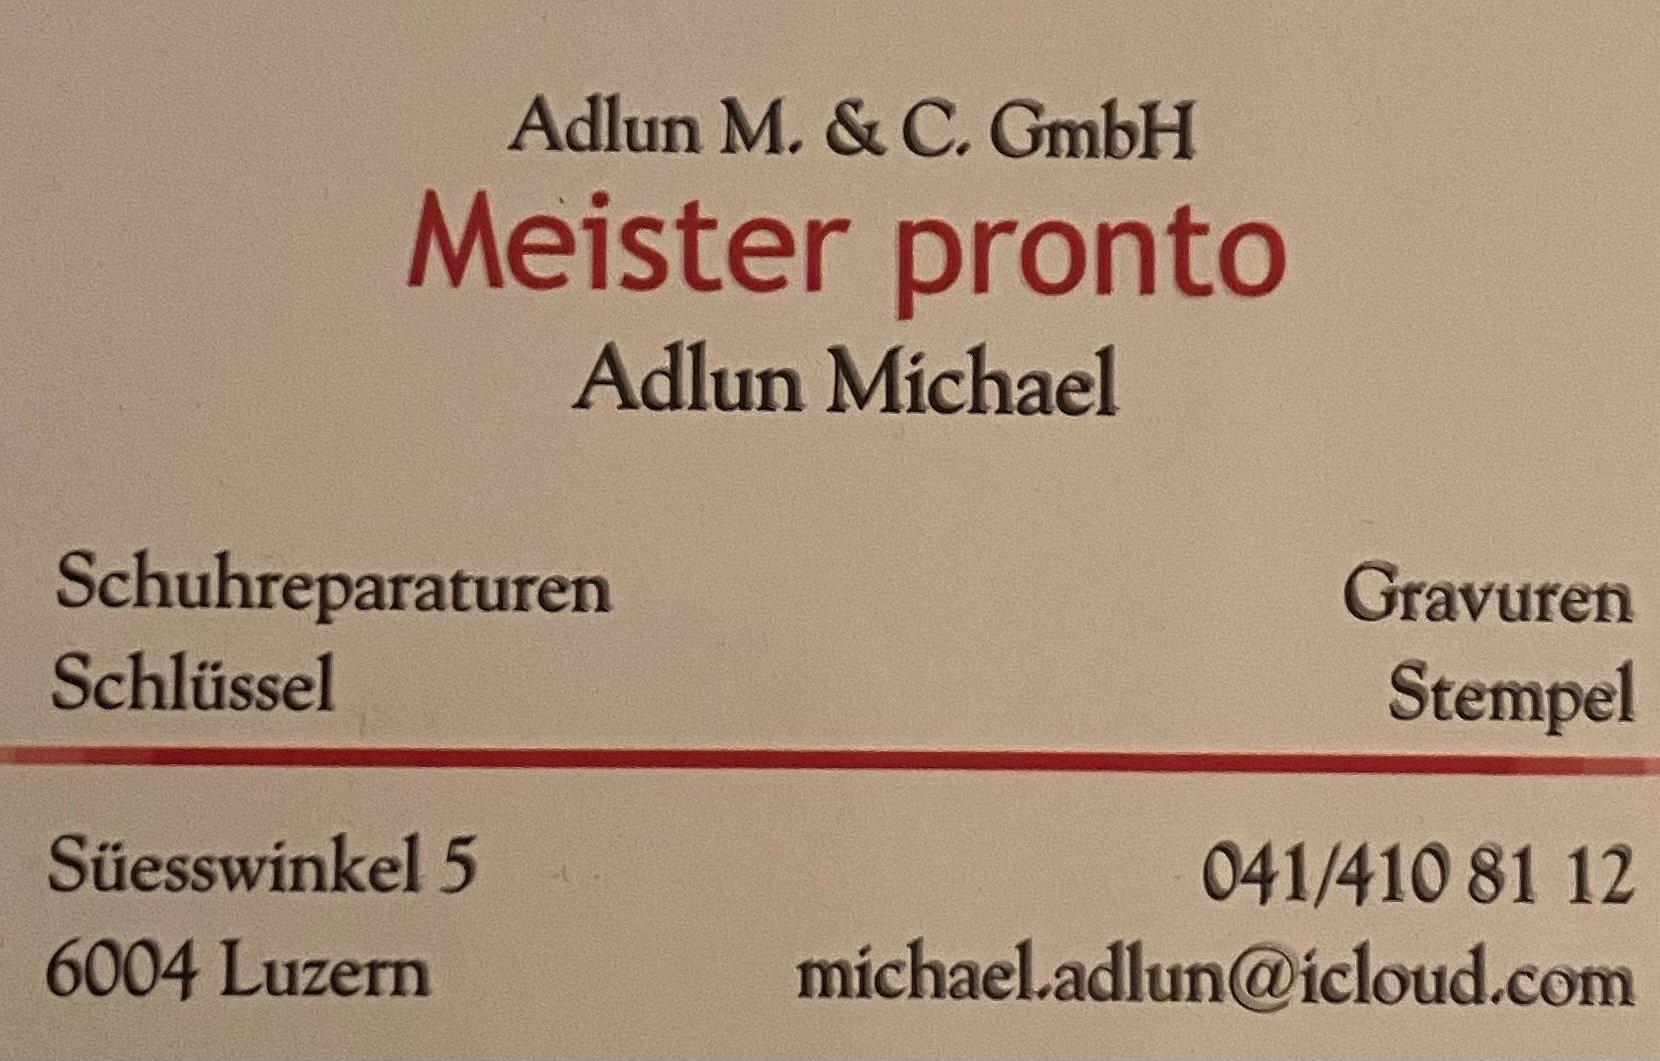 Adlun M. & C. GmbH